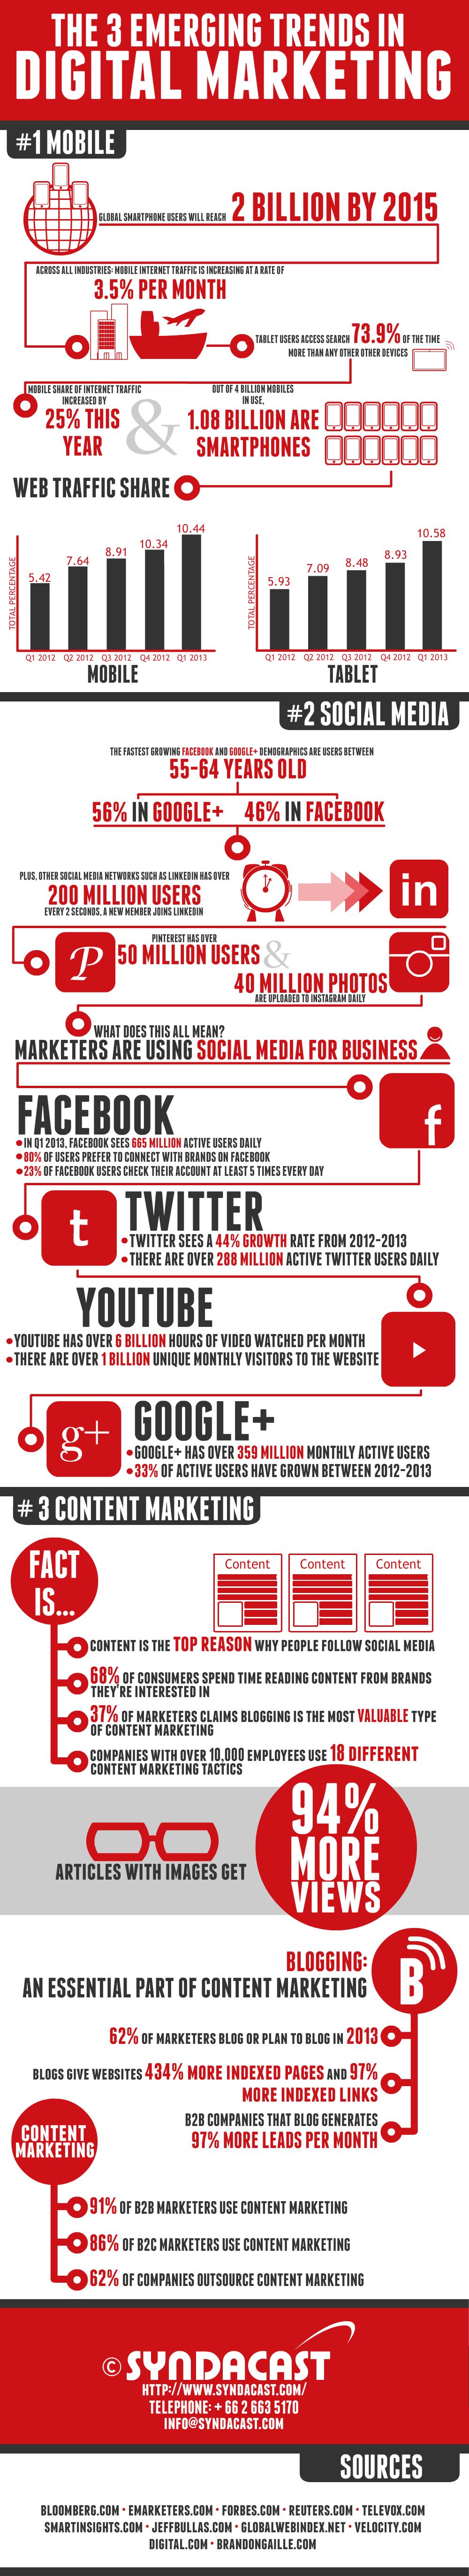 The 3 Emerging Trends in Digital Marketing